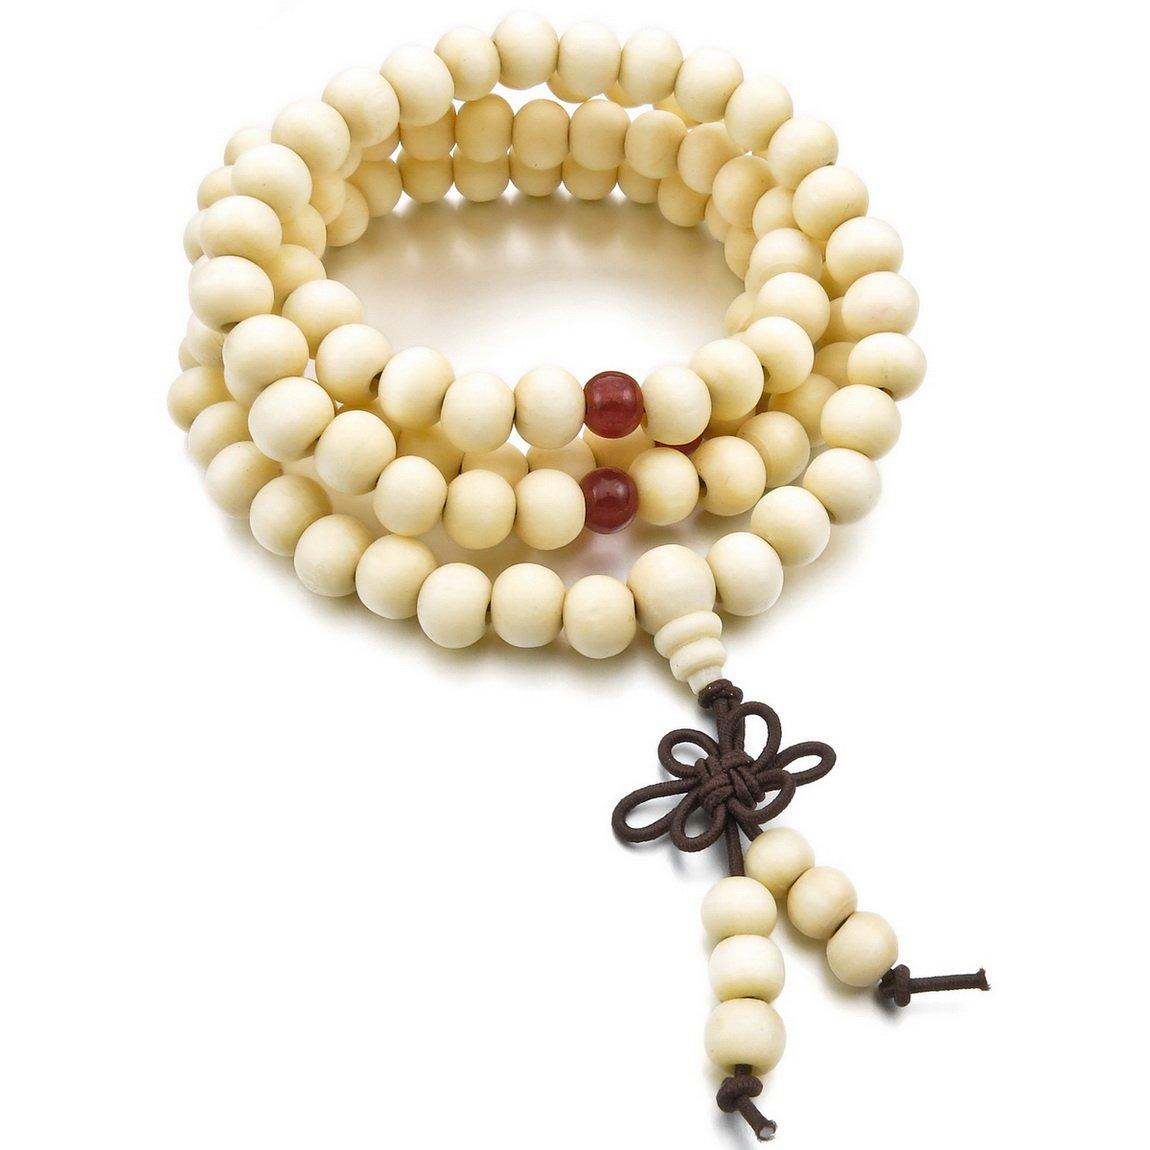 INBLUE Men,Womens 8mm Wood Bracelet Link Wrist Necklace Chain Tibetan Buddhist Sandalwood Bead Prayer Buddha Mala Chinese knot Elastic INBLUE Jewelry mnb0912-2